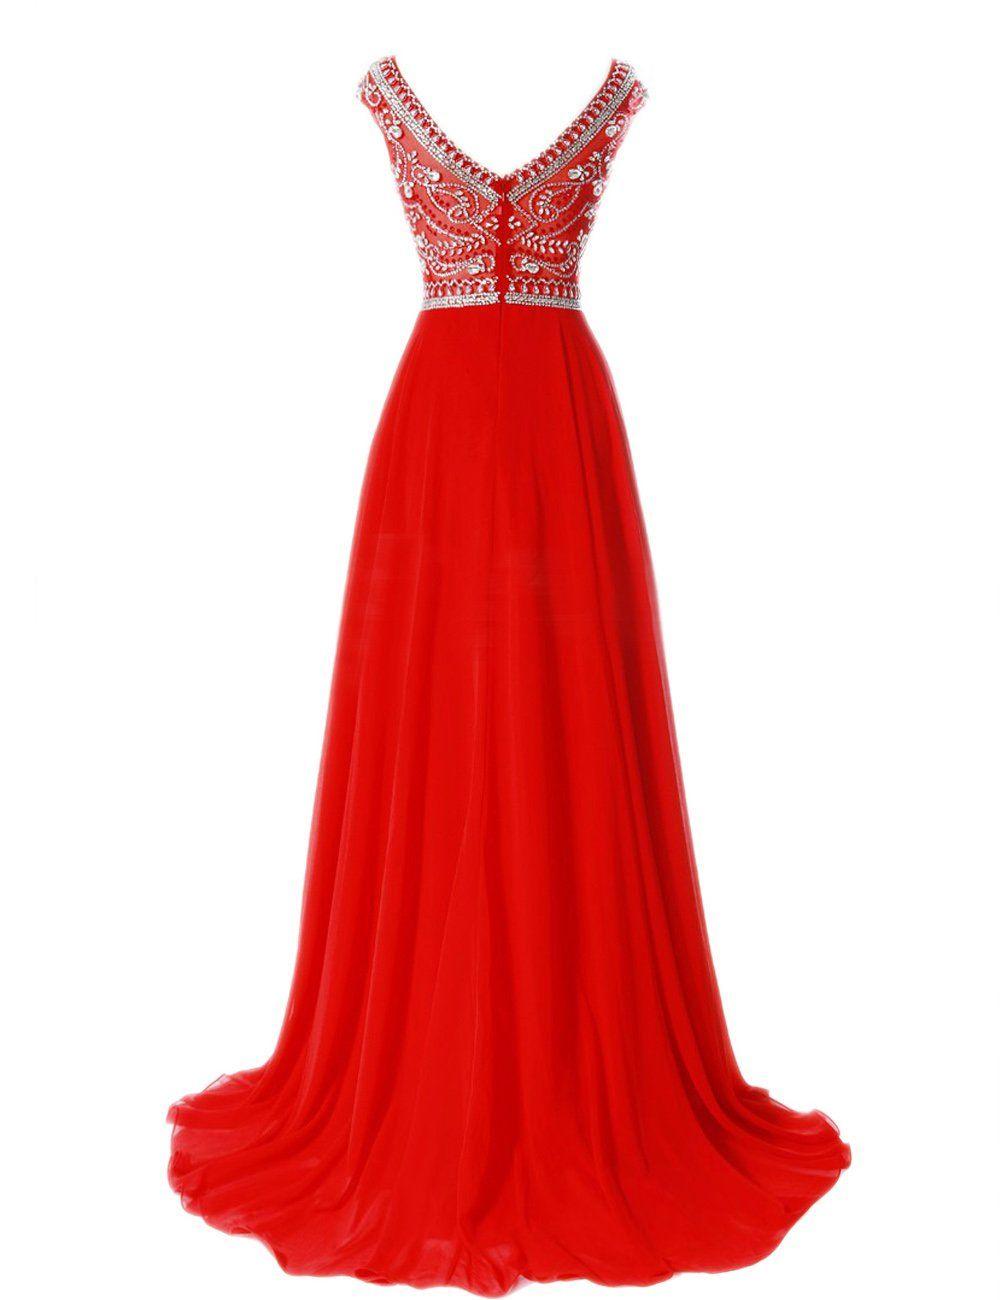 Tidetell elegant floor length bridesmaid cap sleeve prom evening